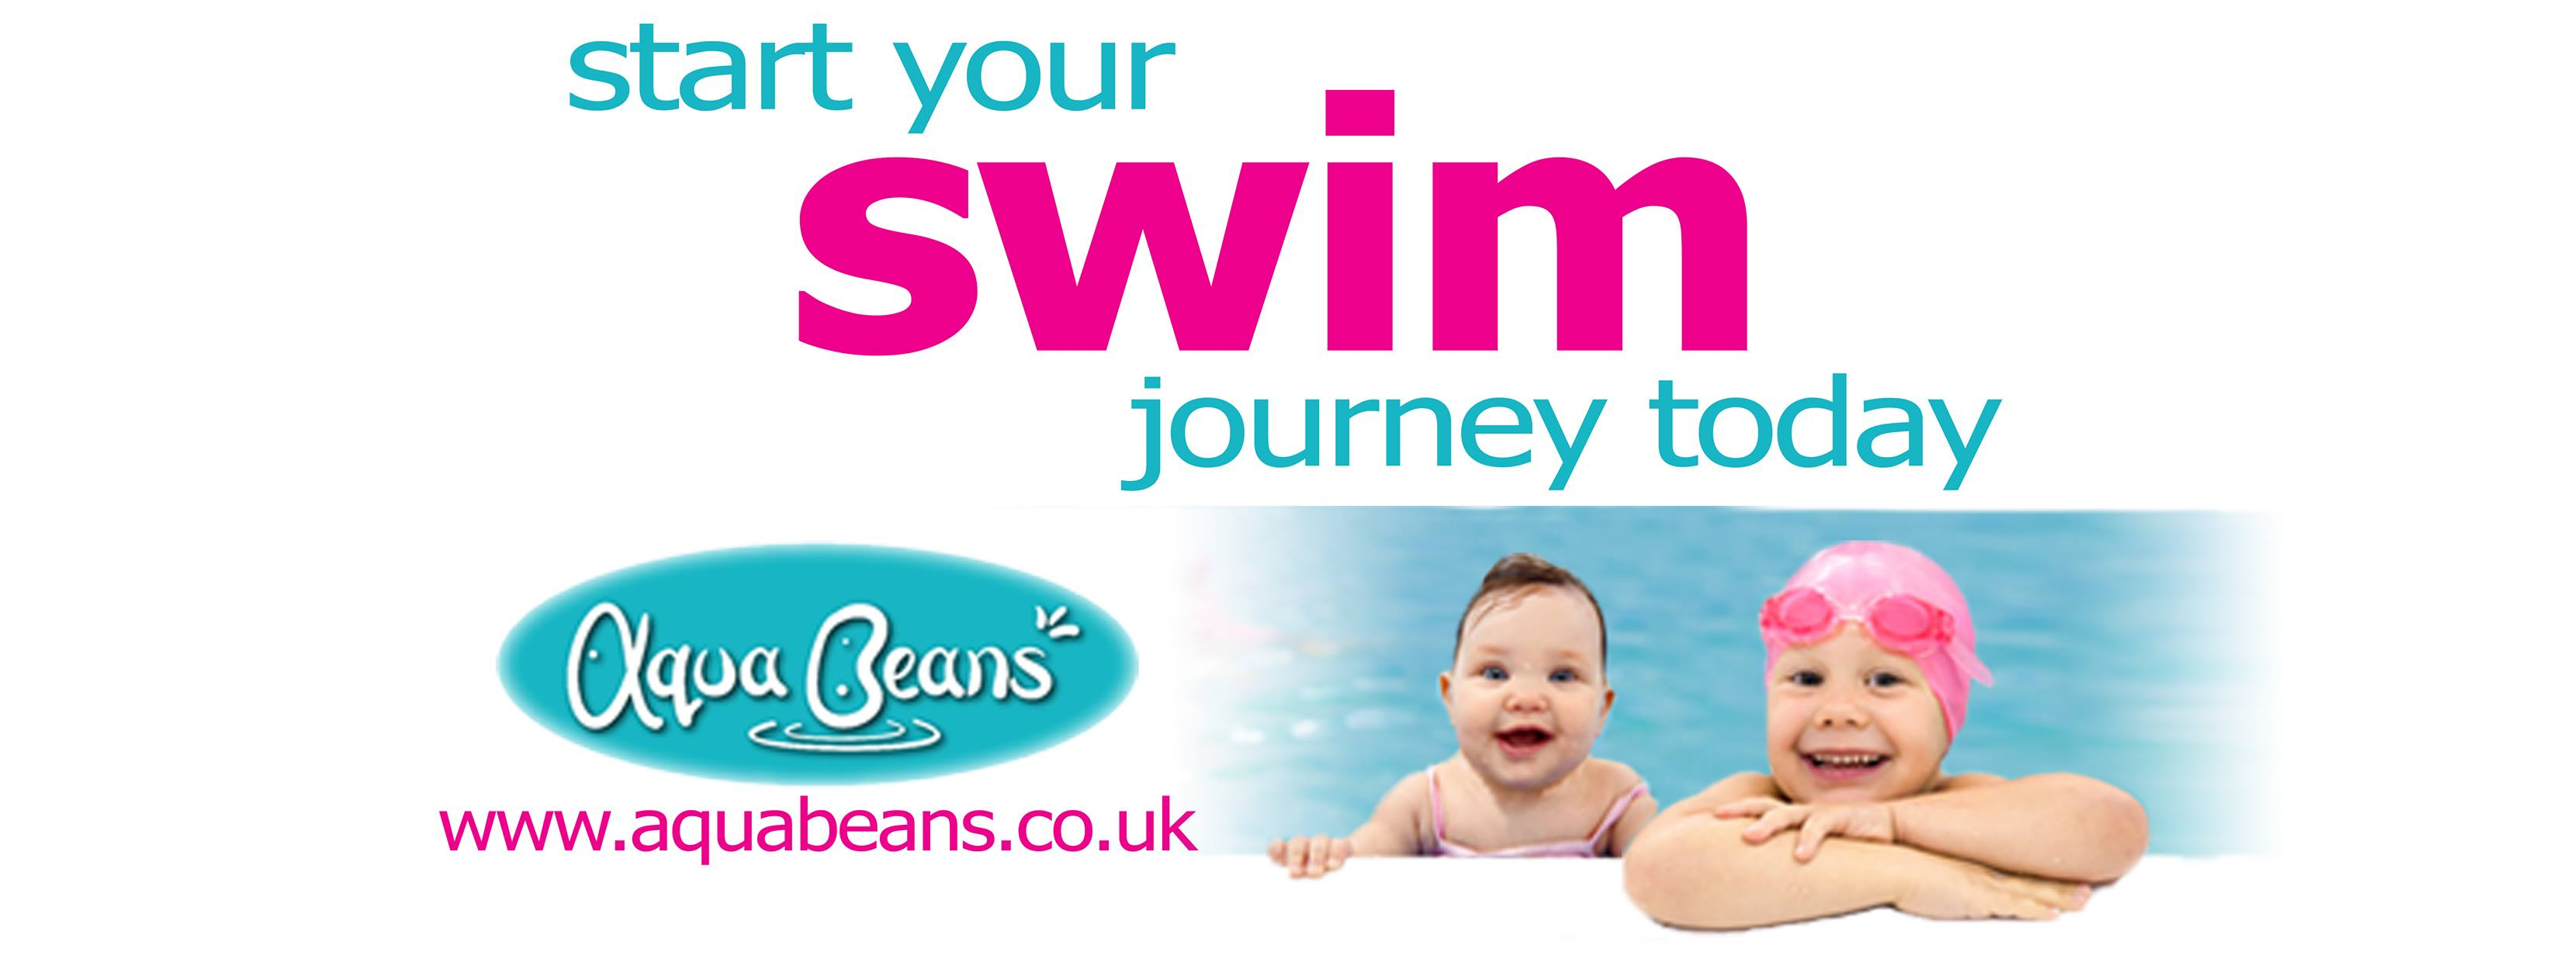 Aqua Beans's main image